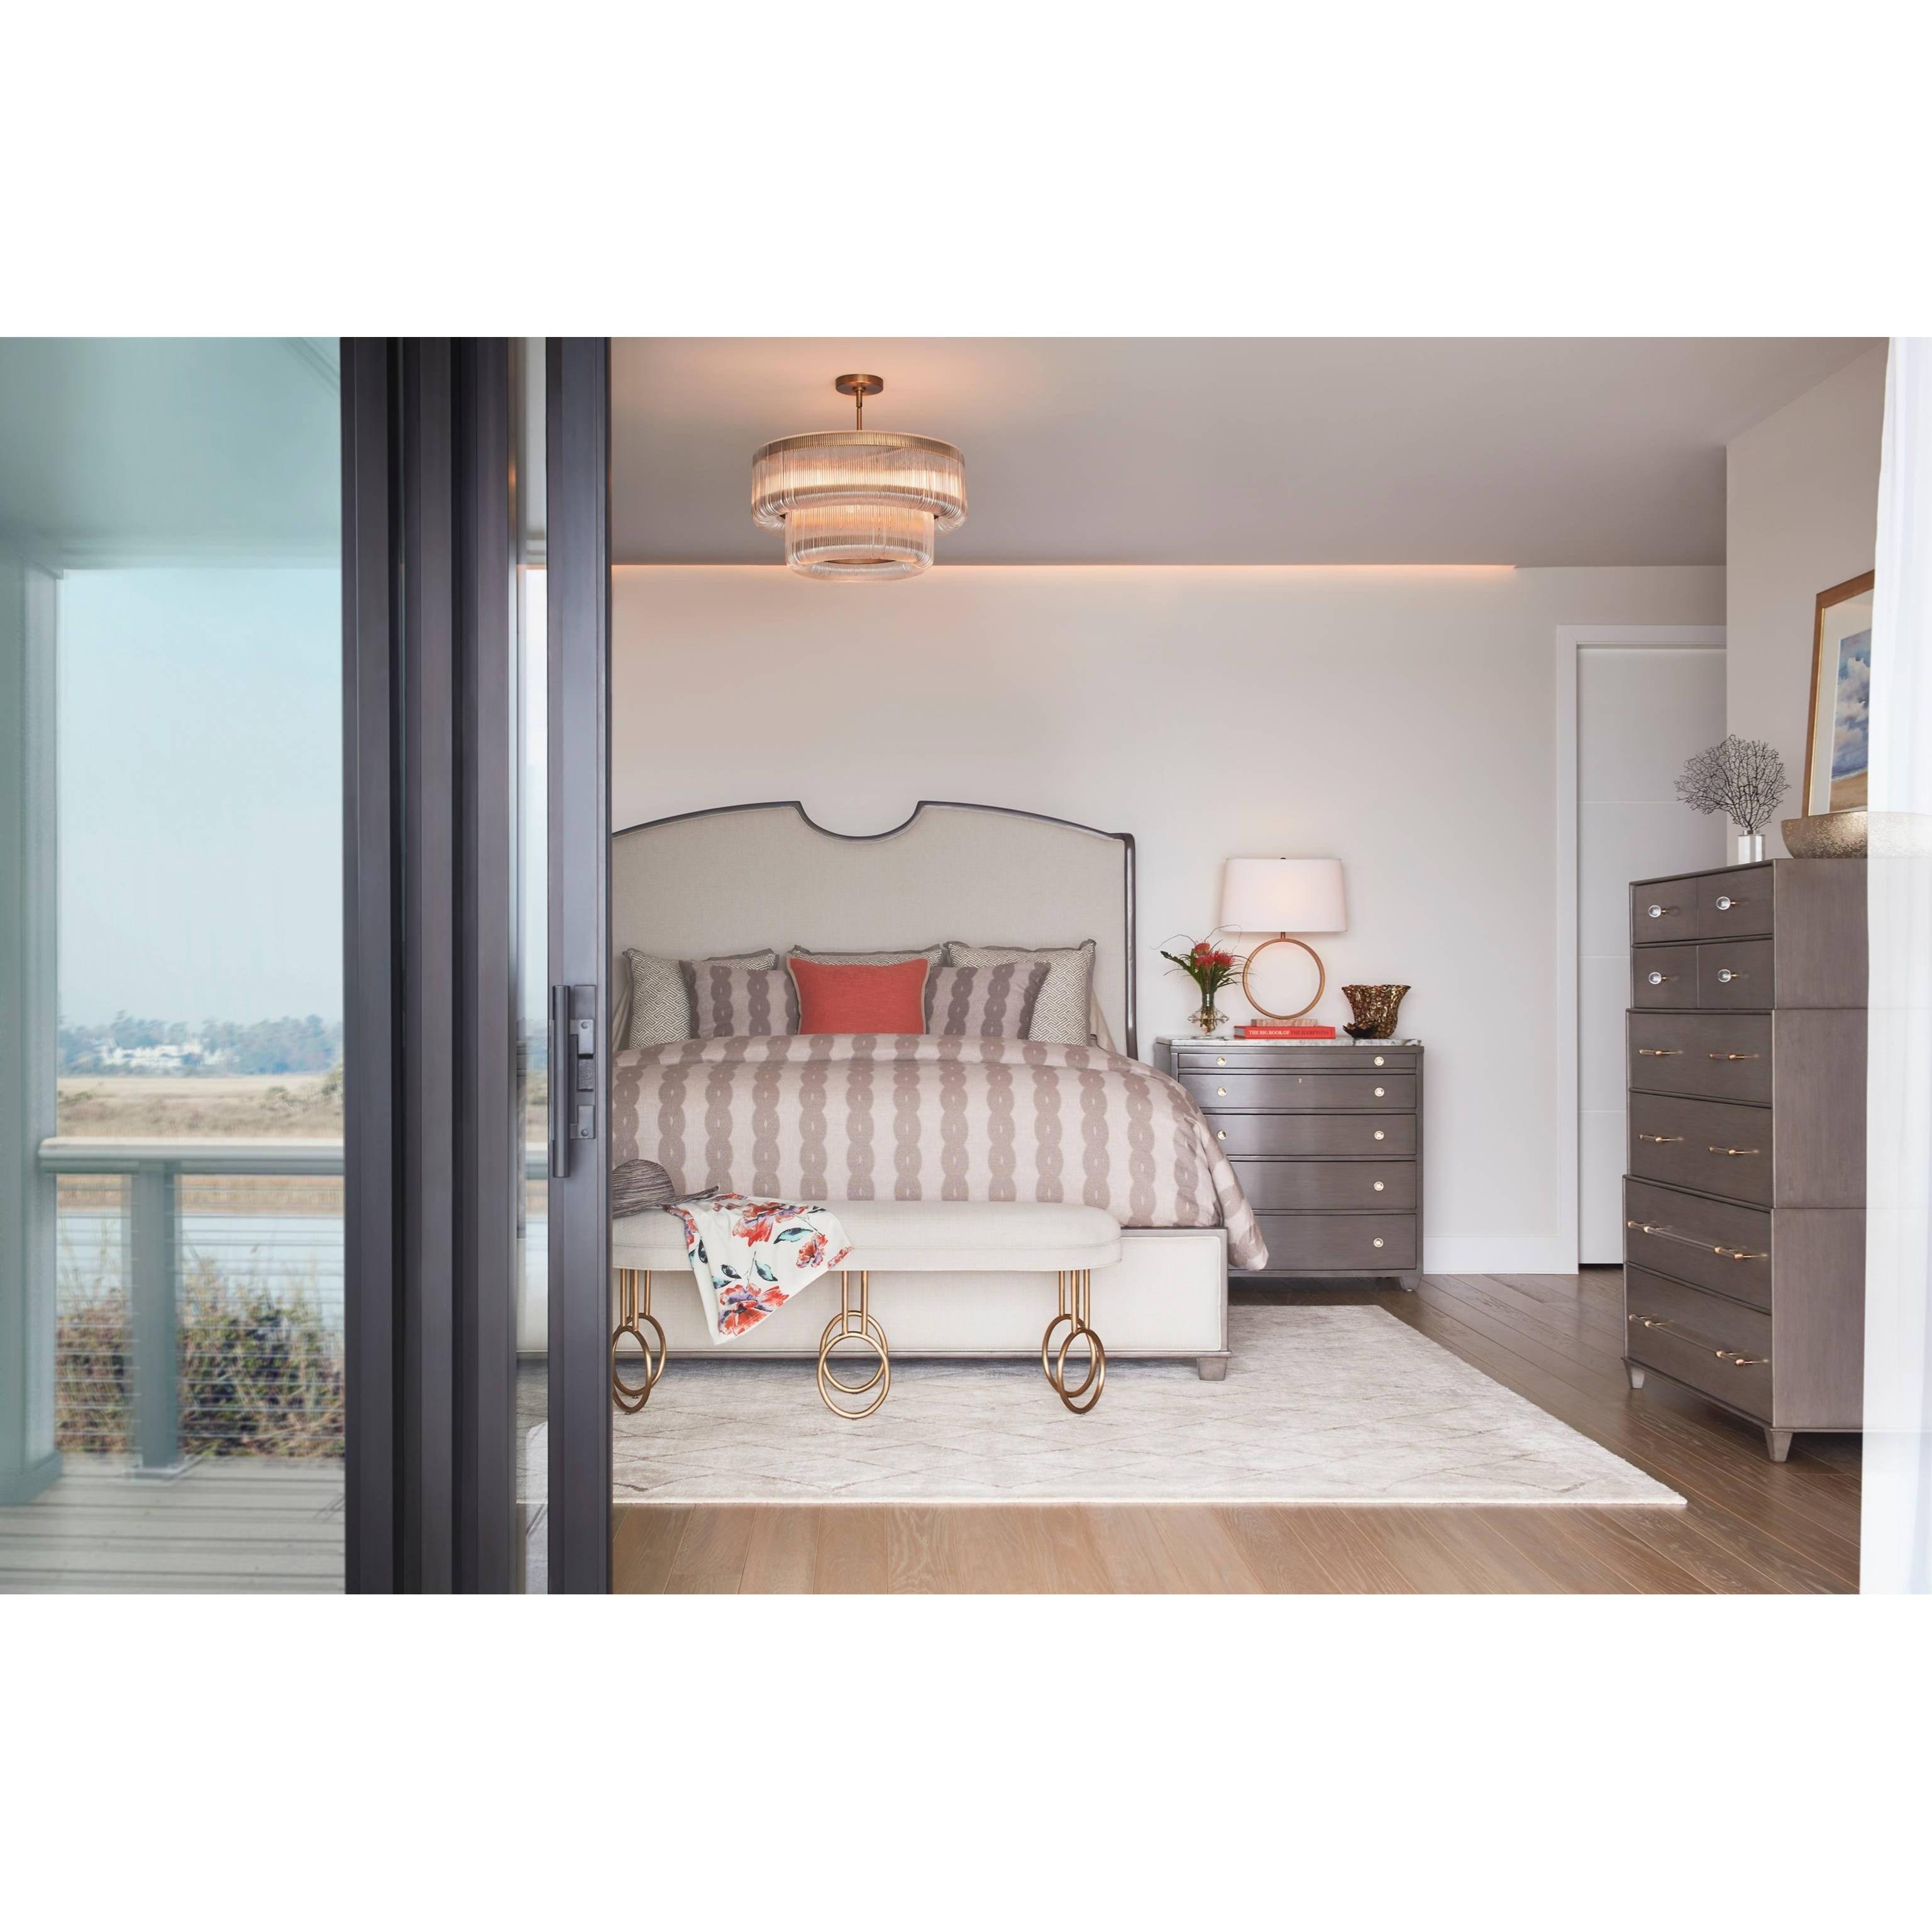 Stanley Furniture Coastal Living Oasis California King Bedroom Group - Item Number: 527-6 CK Bedroom Group 4